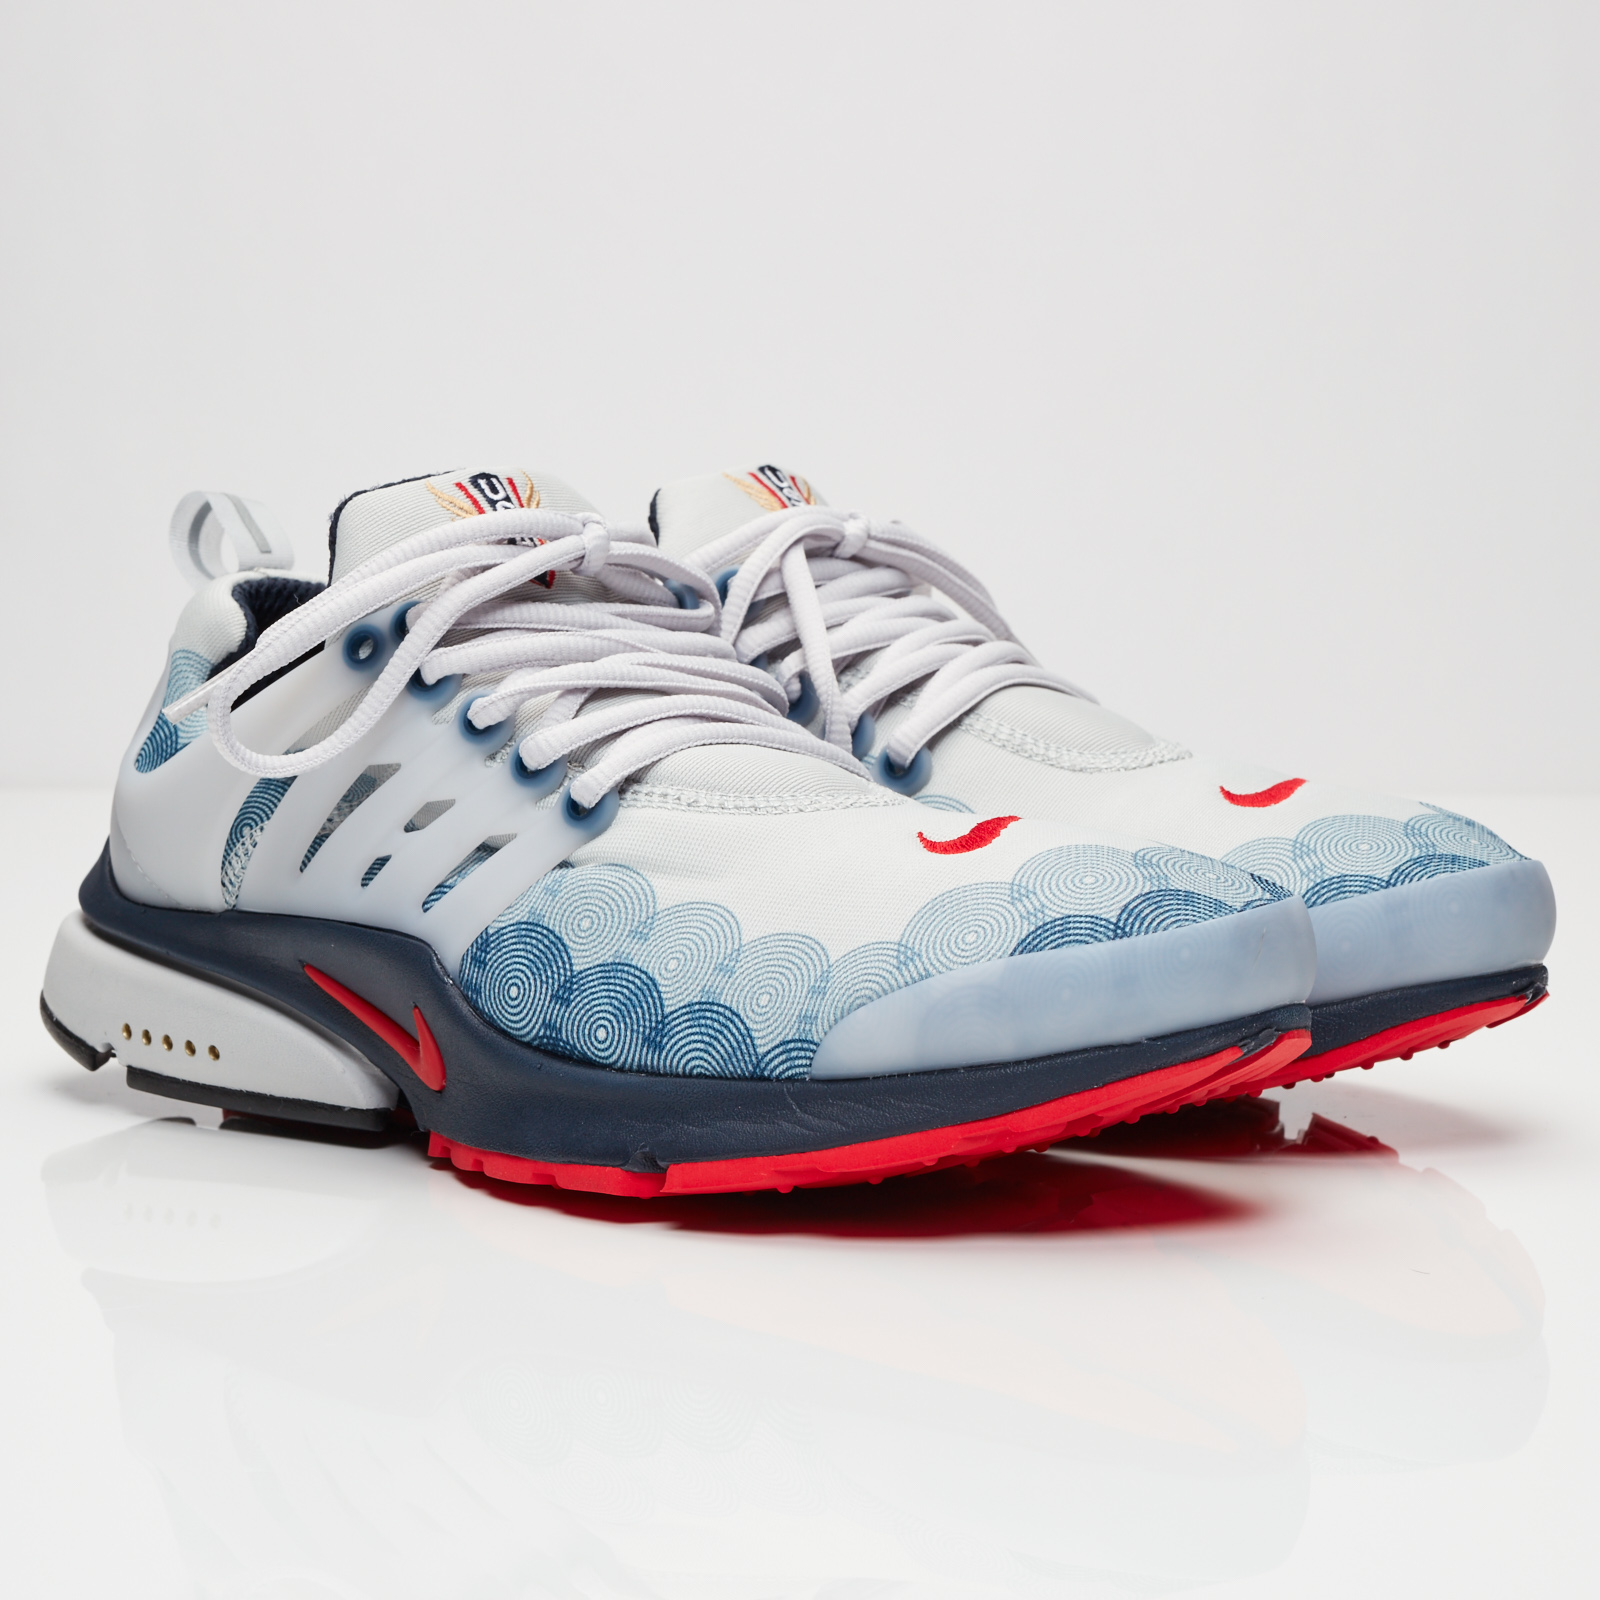 quality design 8ca67 2cb0d Nike Air Presto GPX